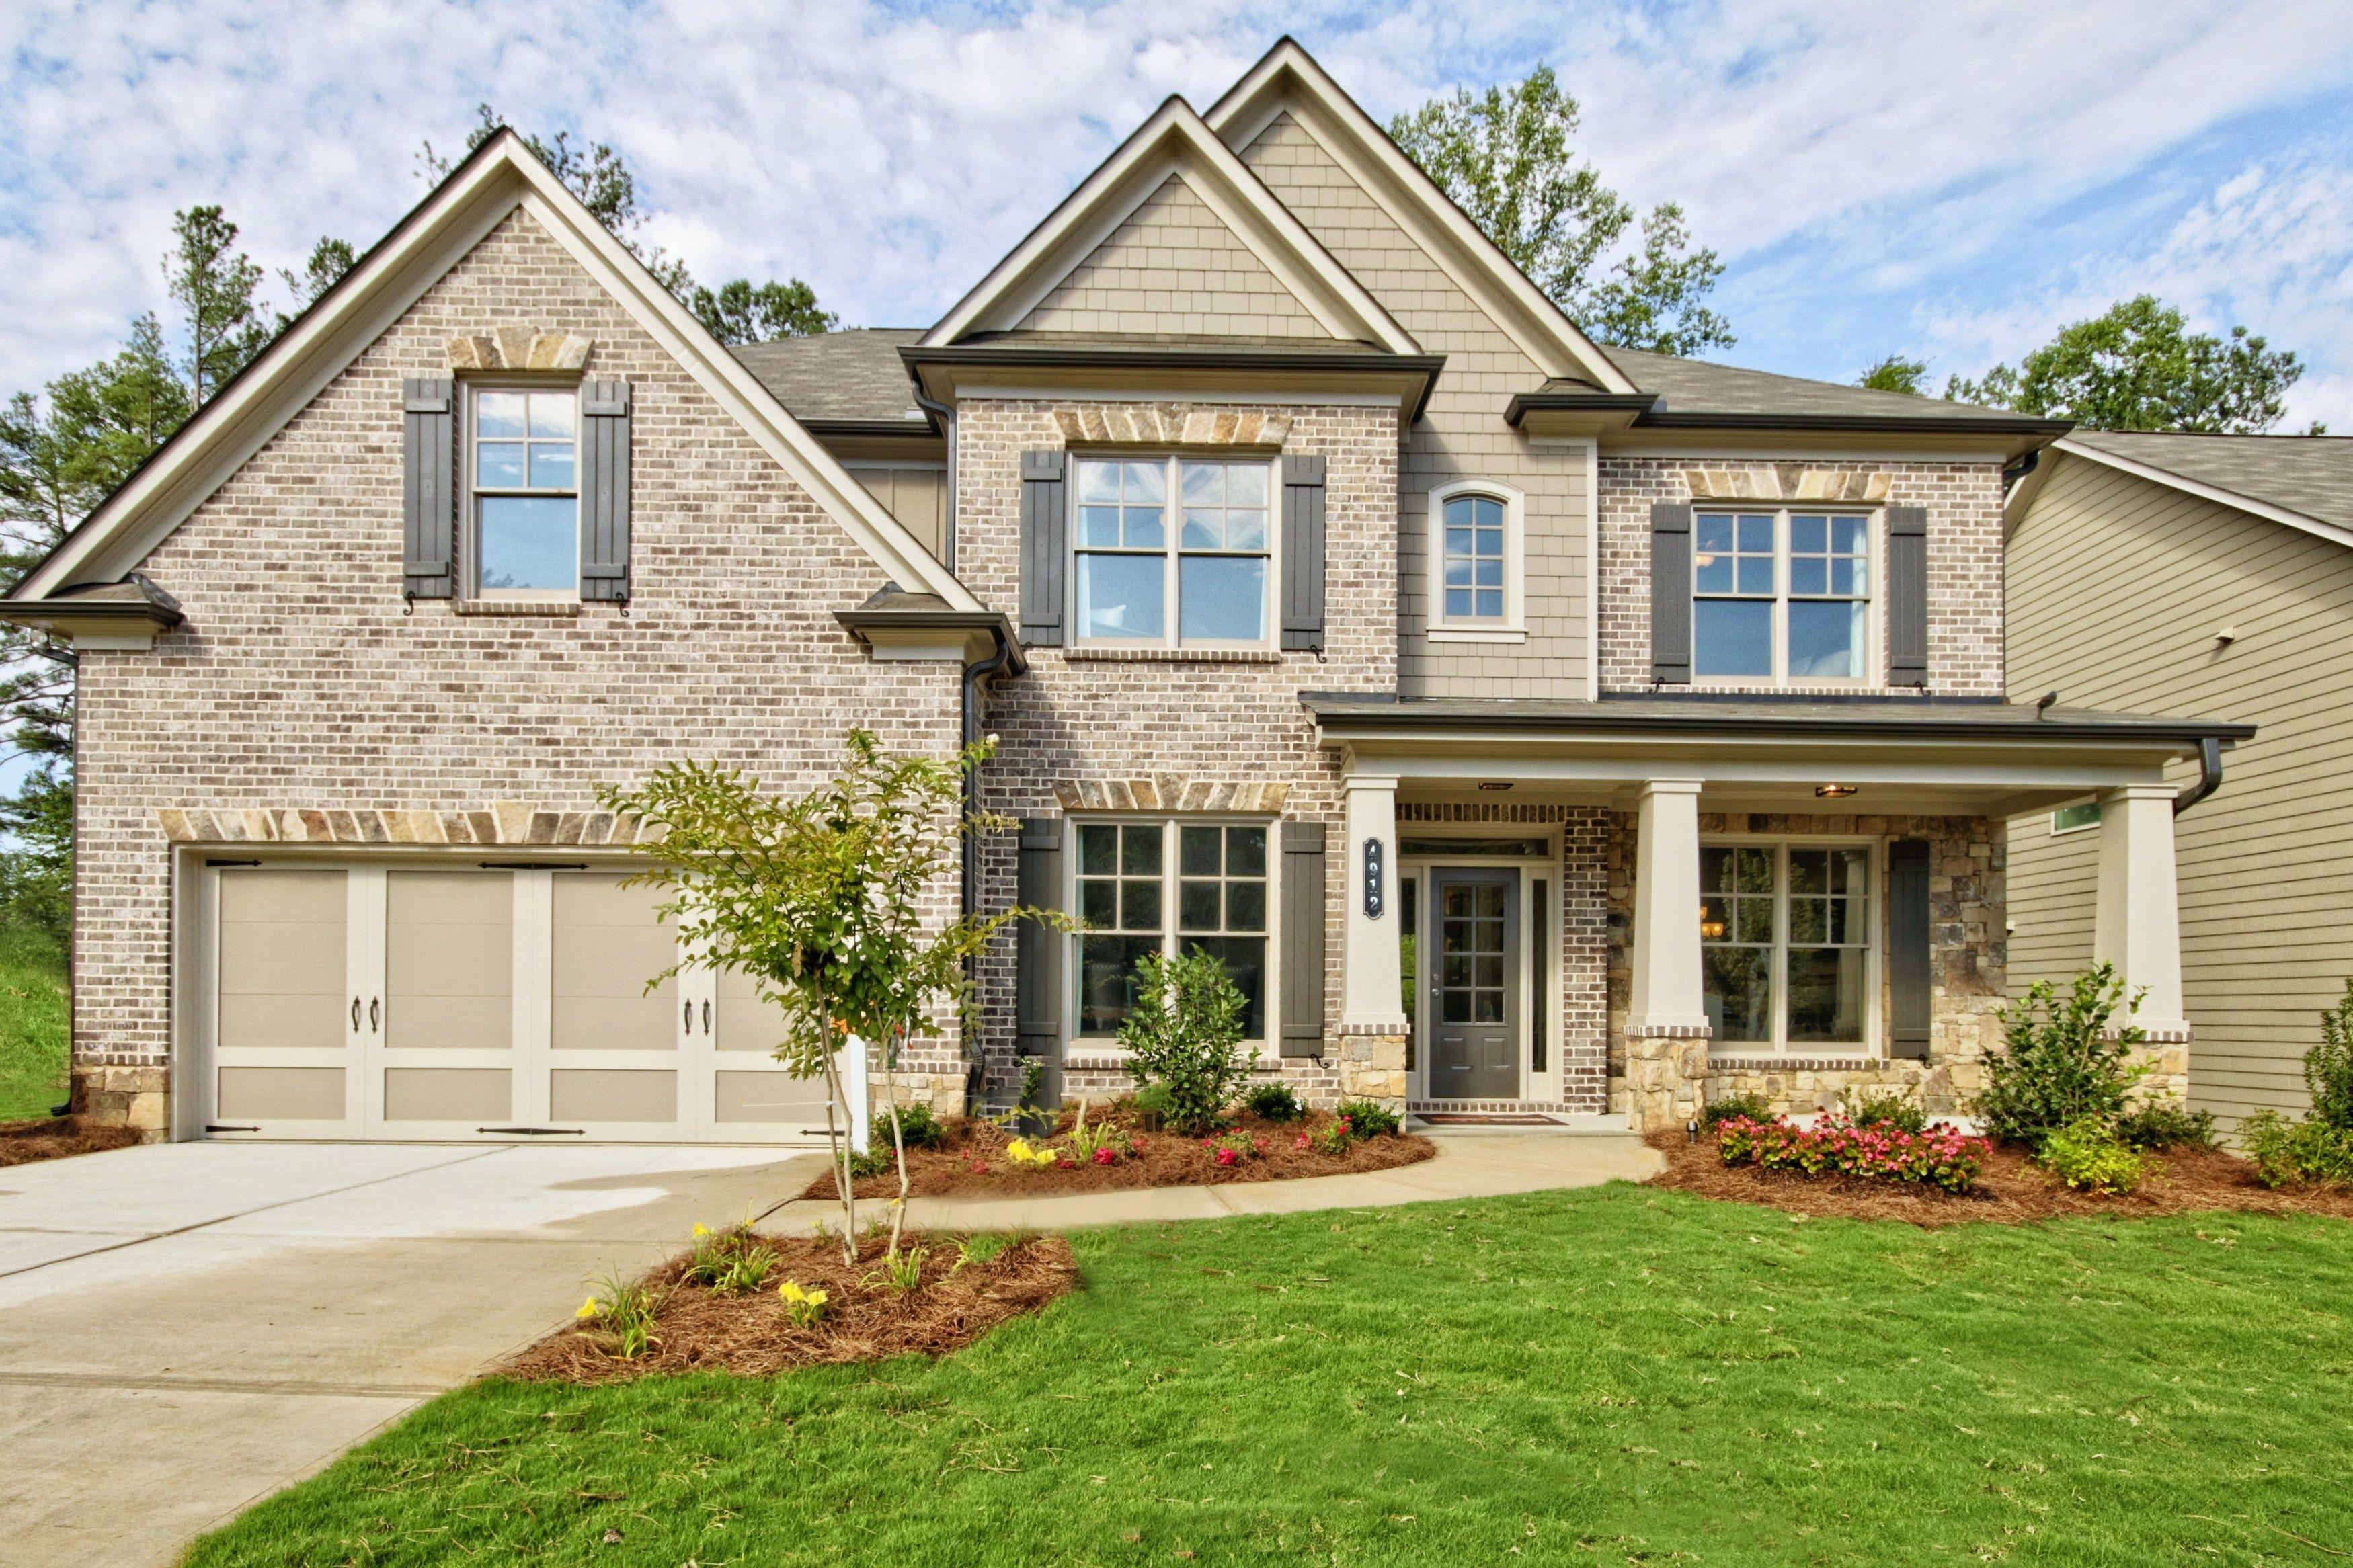 Один семья для того Продажа на Home South Communities Westleigh 895 Grove Glen Court Sugar Hill, Georgia 30518 United States